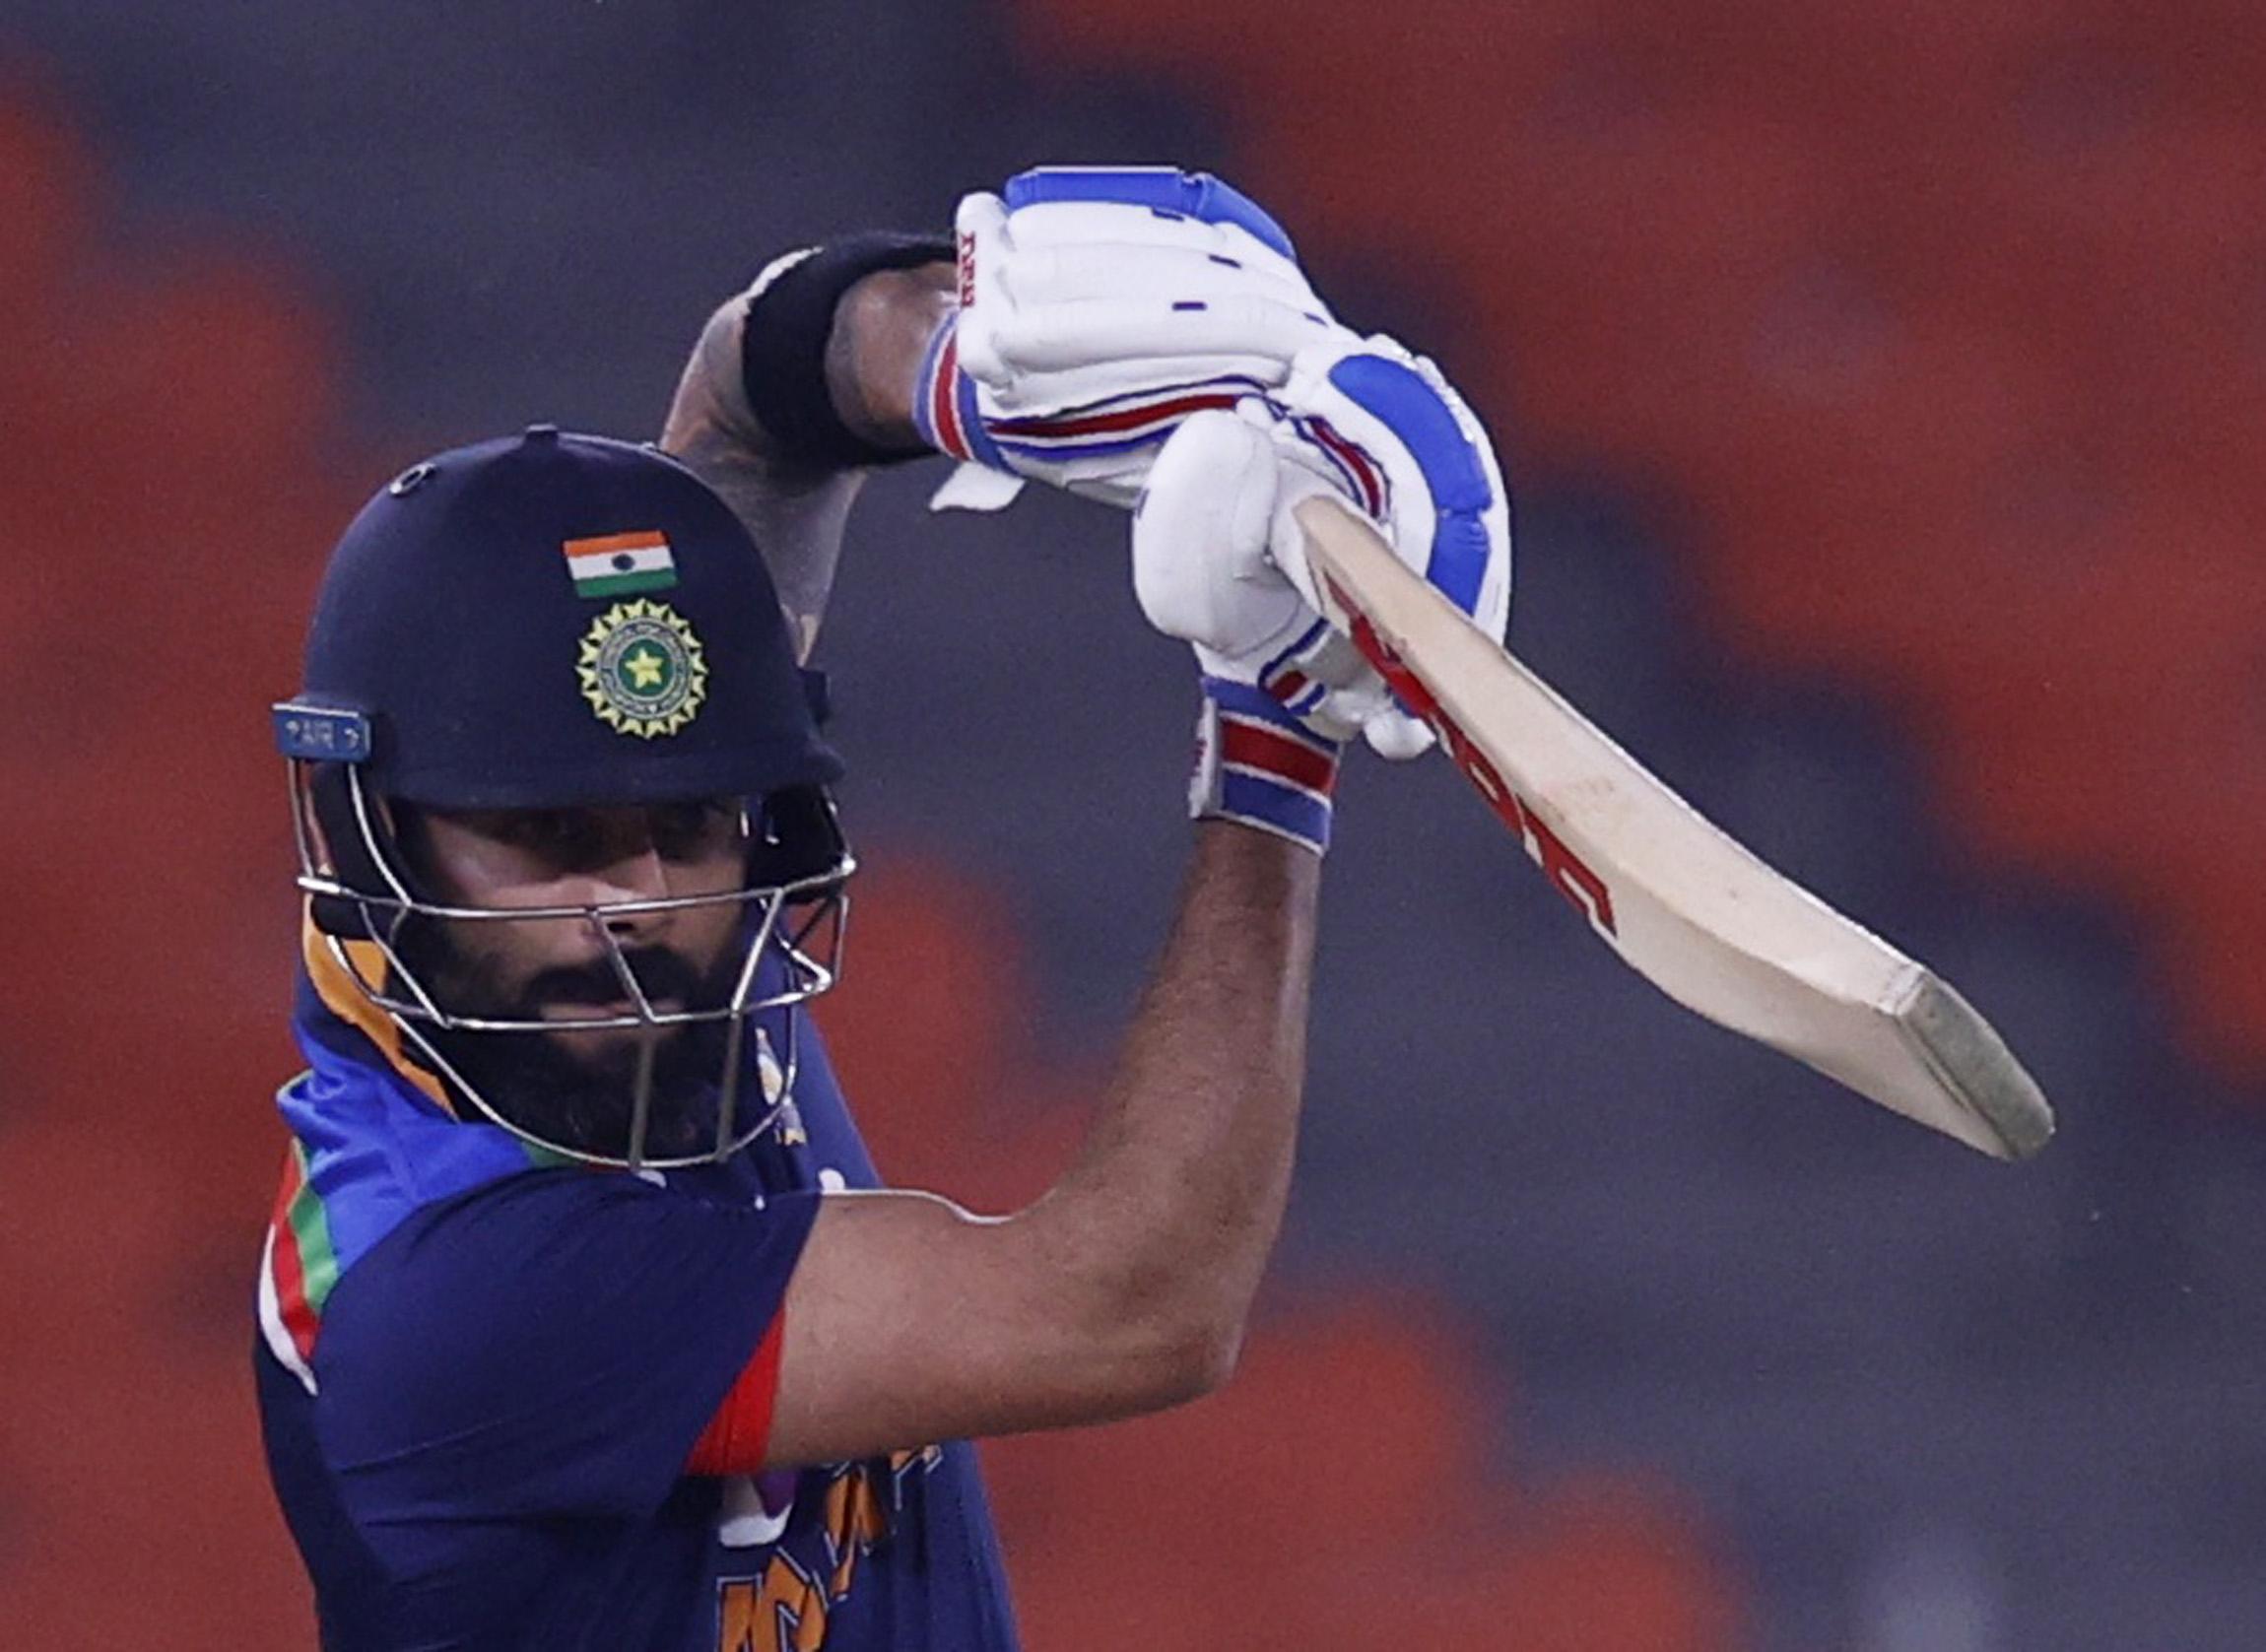 Cricket - Fifth Twenty20 International - India v England - Narendra Modi Stadium, Ahmedabad, India - March 20, 2021 India's Virat Kohli in action REUTERS/Danish Siddiqui